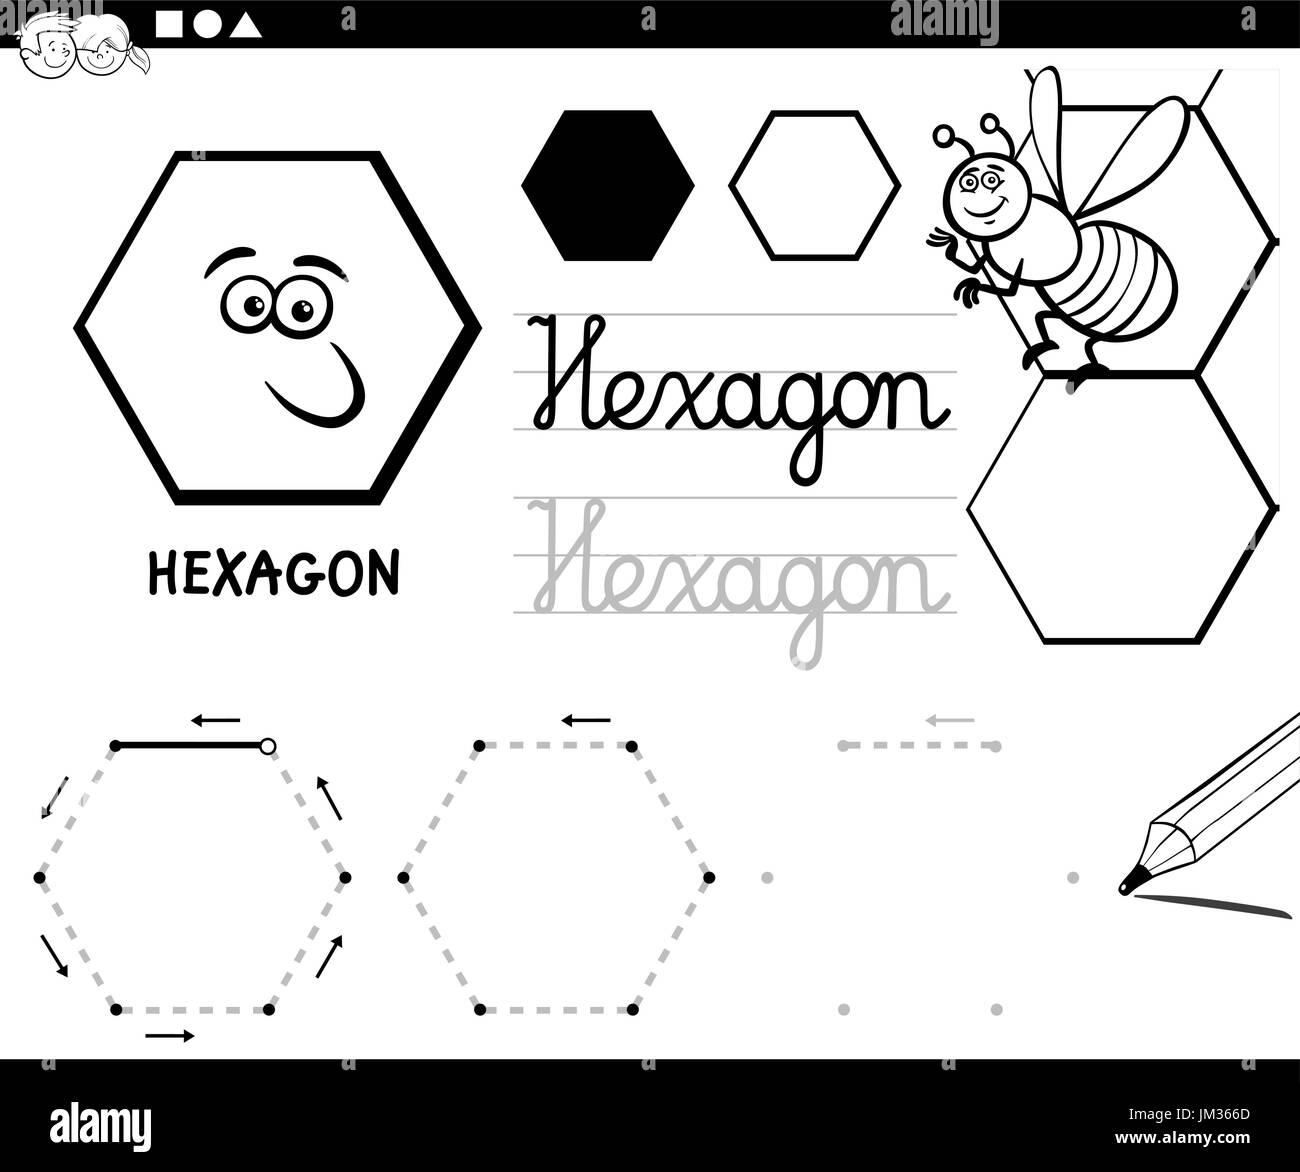 Cartoon Basic Geometric Stockfotos & Cartoon Basic Geometric Bilder ...